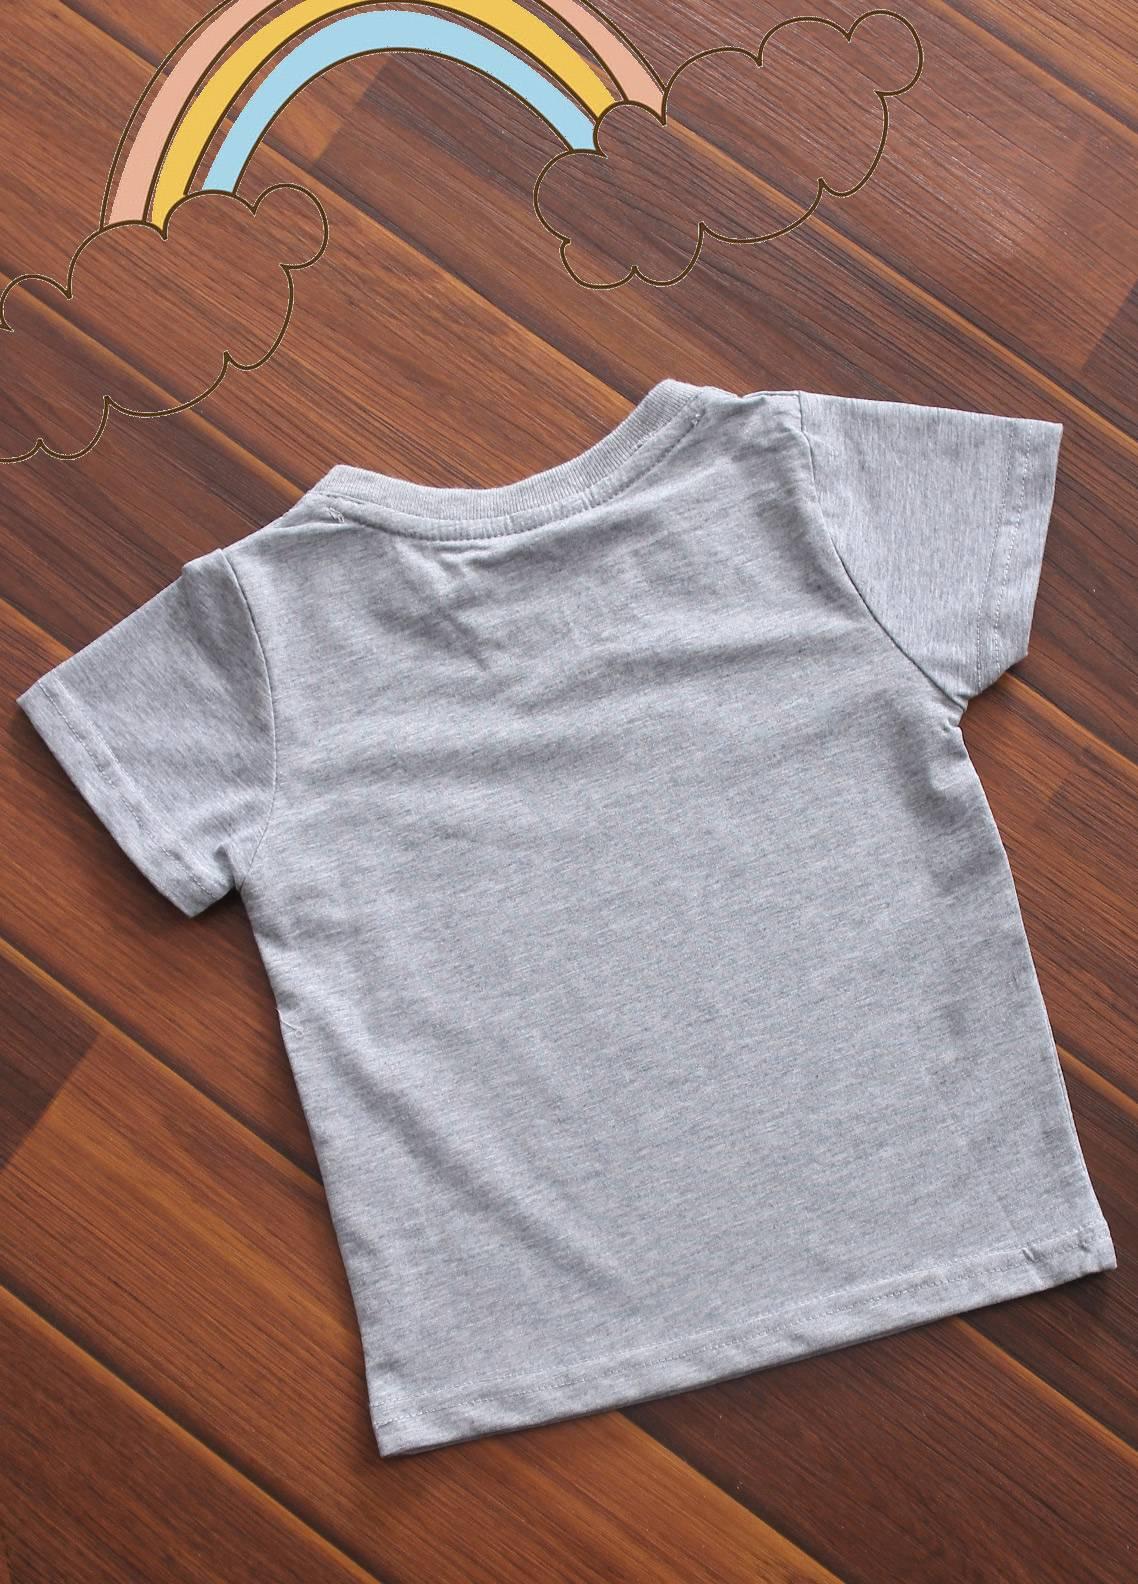 Sanaulla Exclusive Range Cotton V-Neck Boys T-Shirts -  3015 Grey